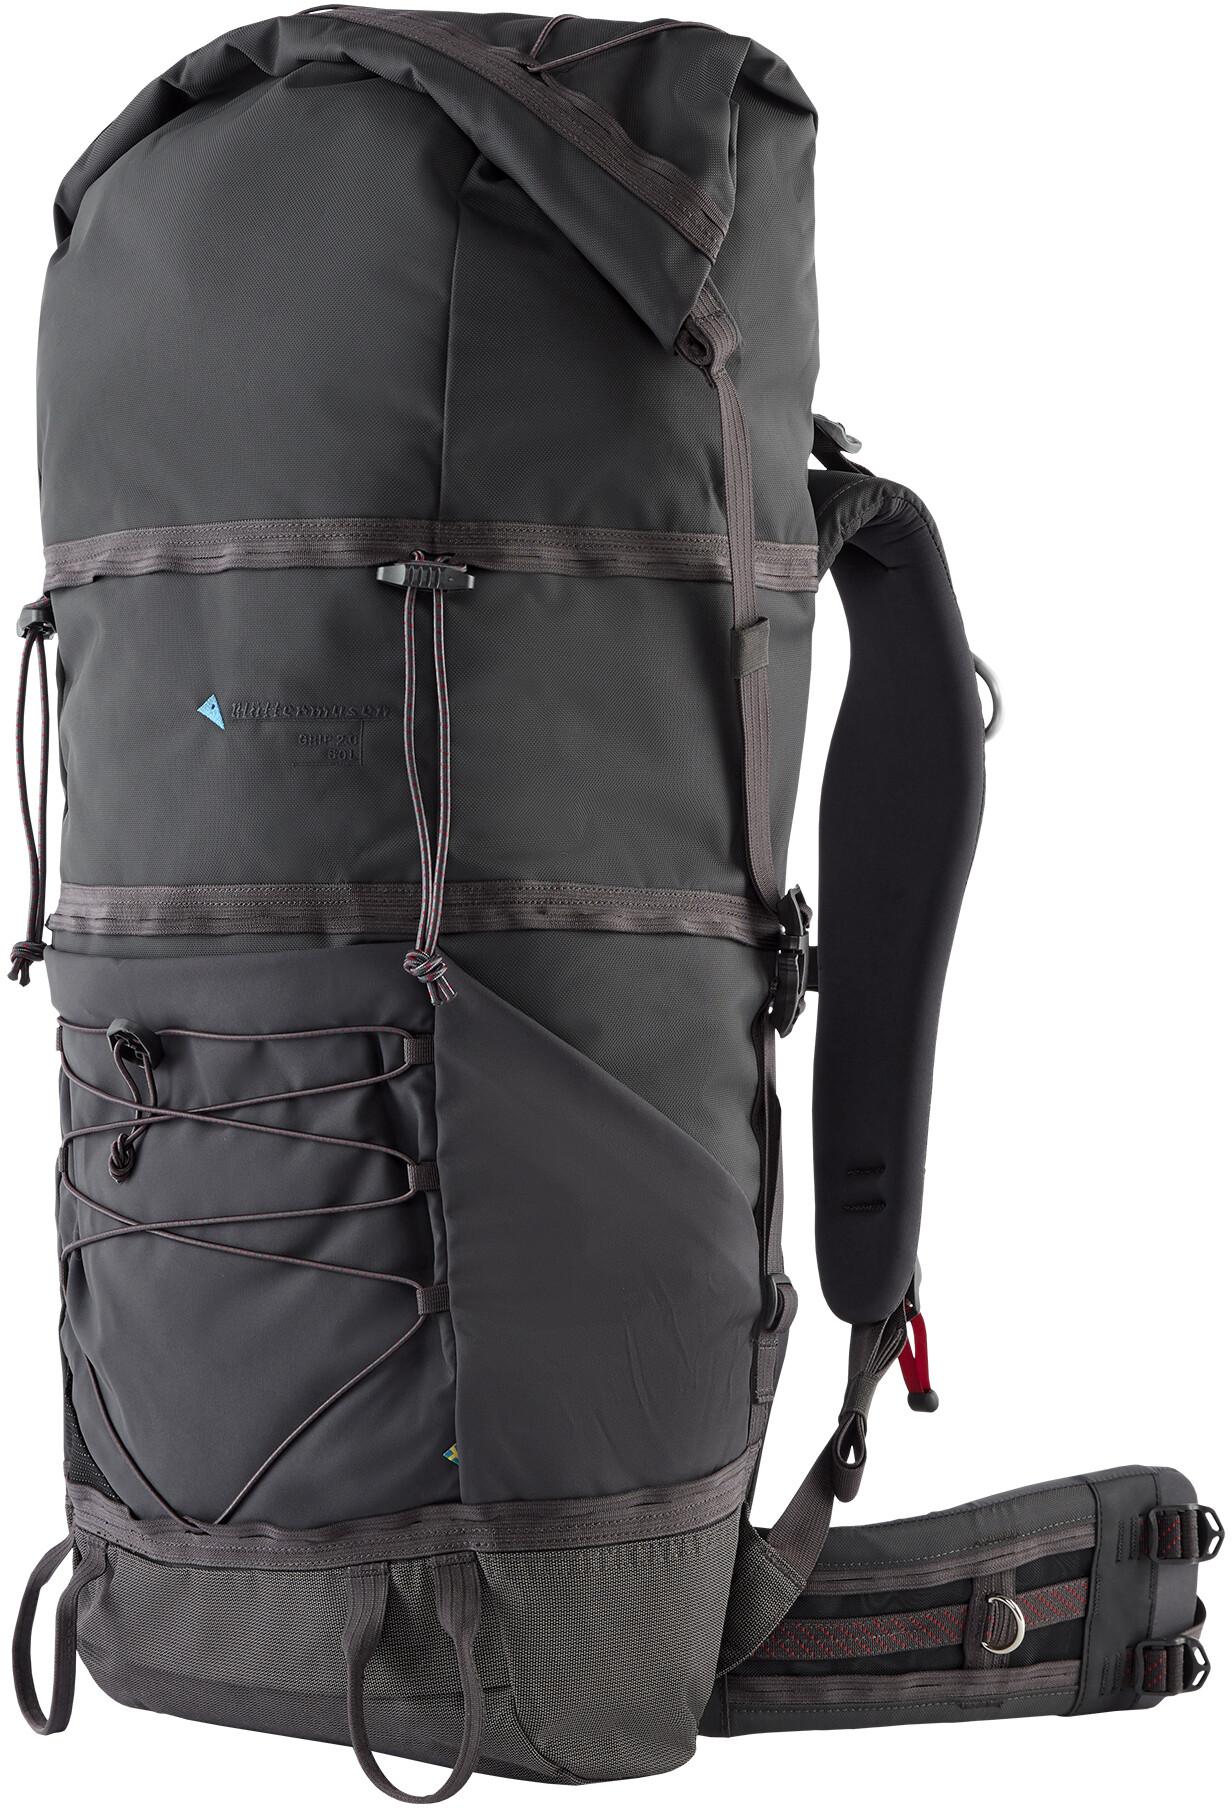 47c3032b Klättermusen Grip 2.0 Trekking Backpack 60L raven at Addnature.co.uk